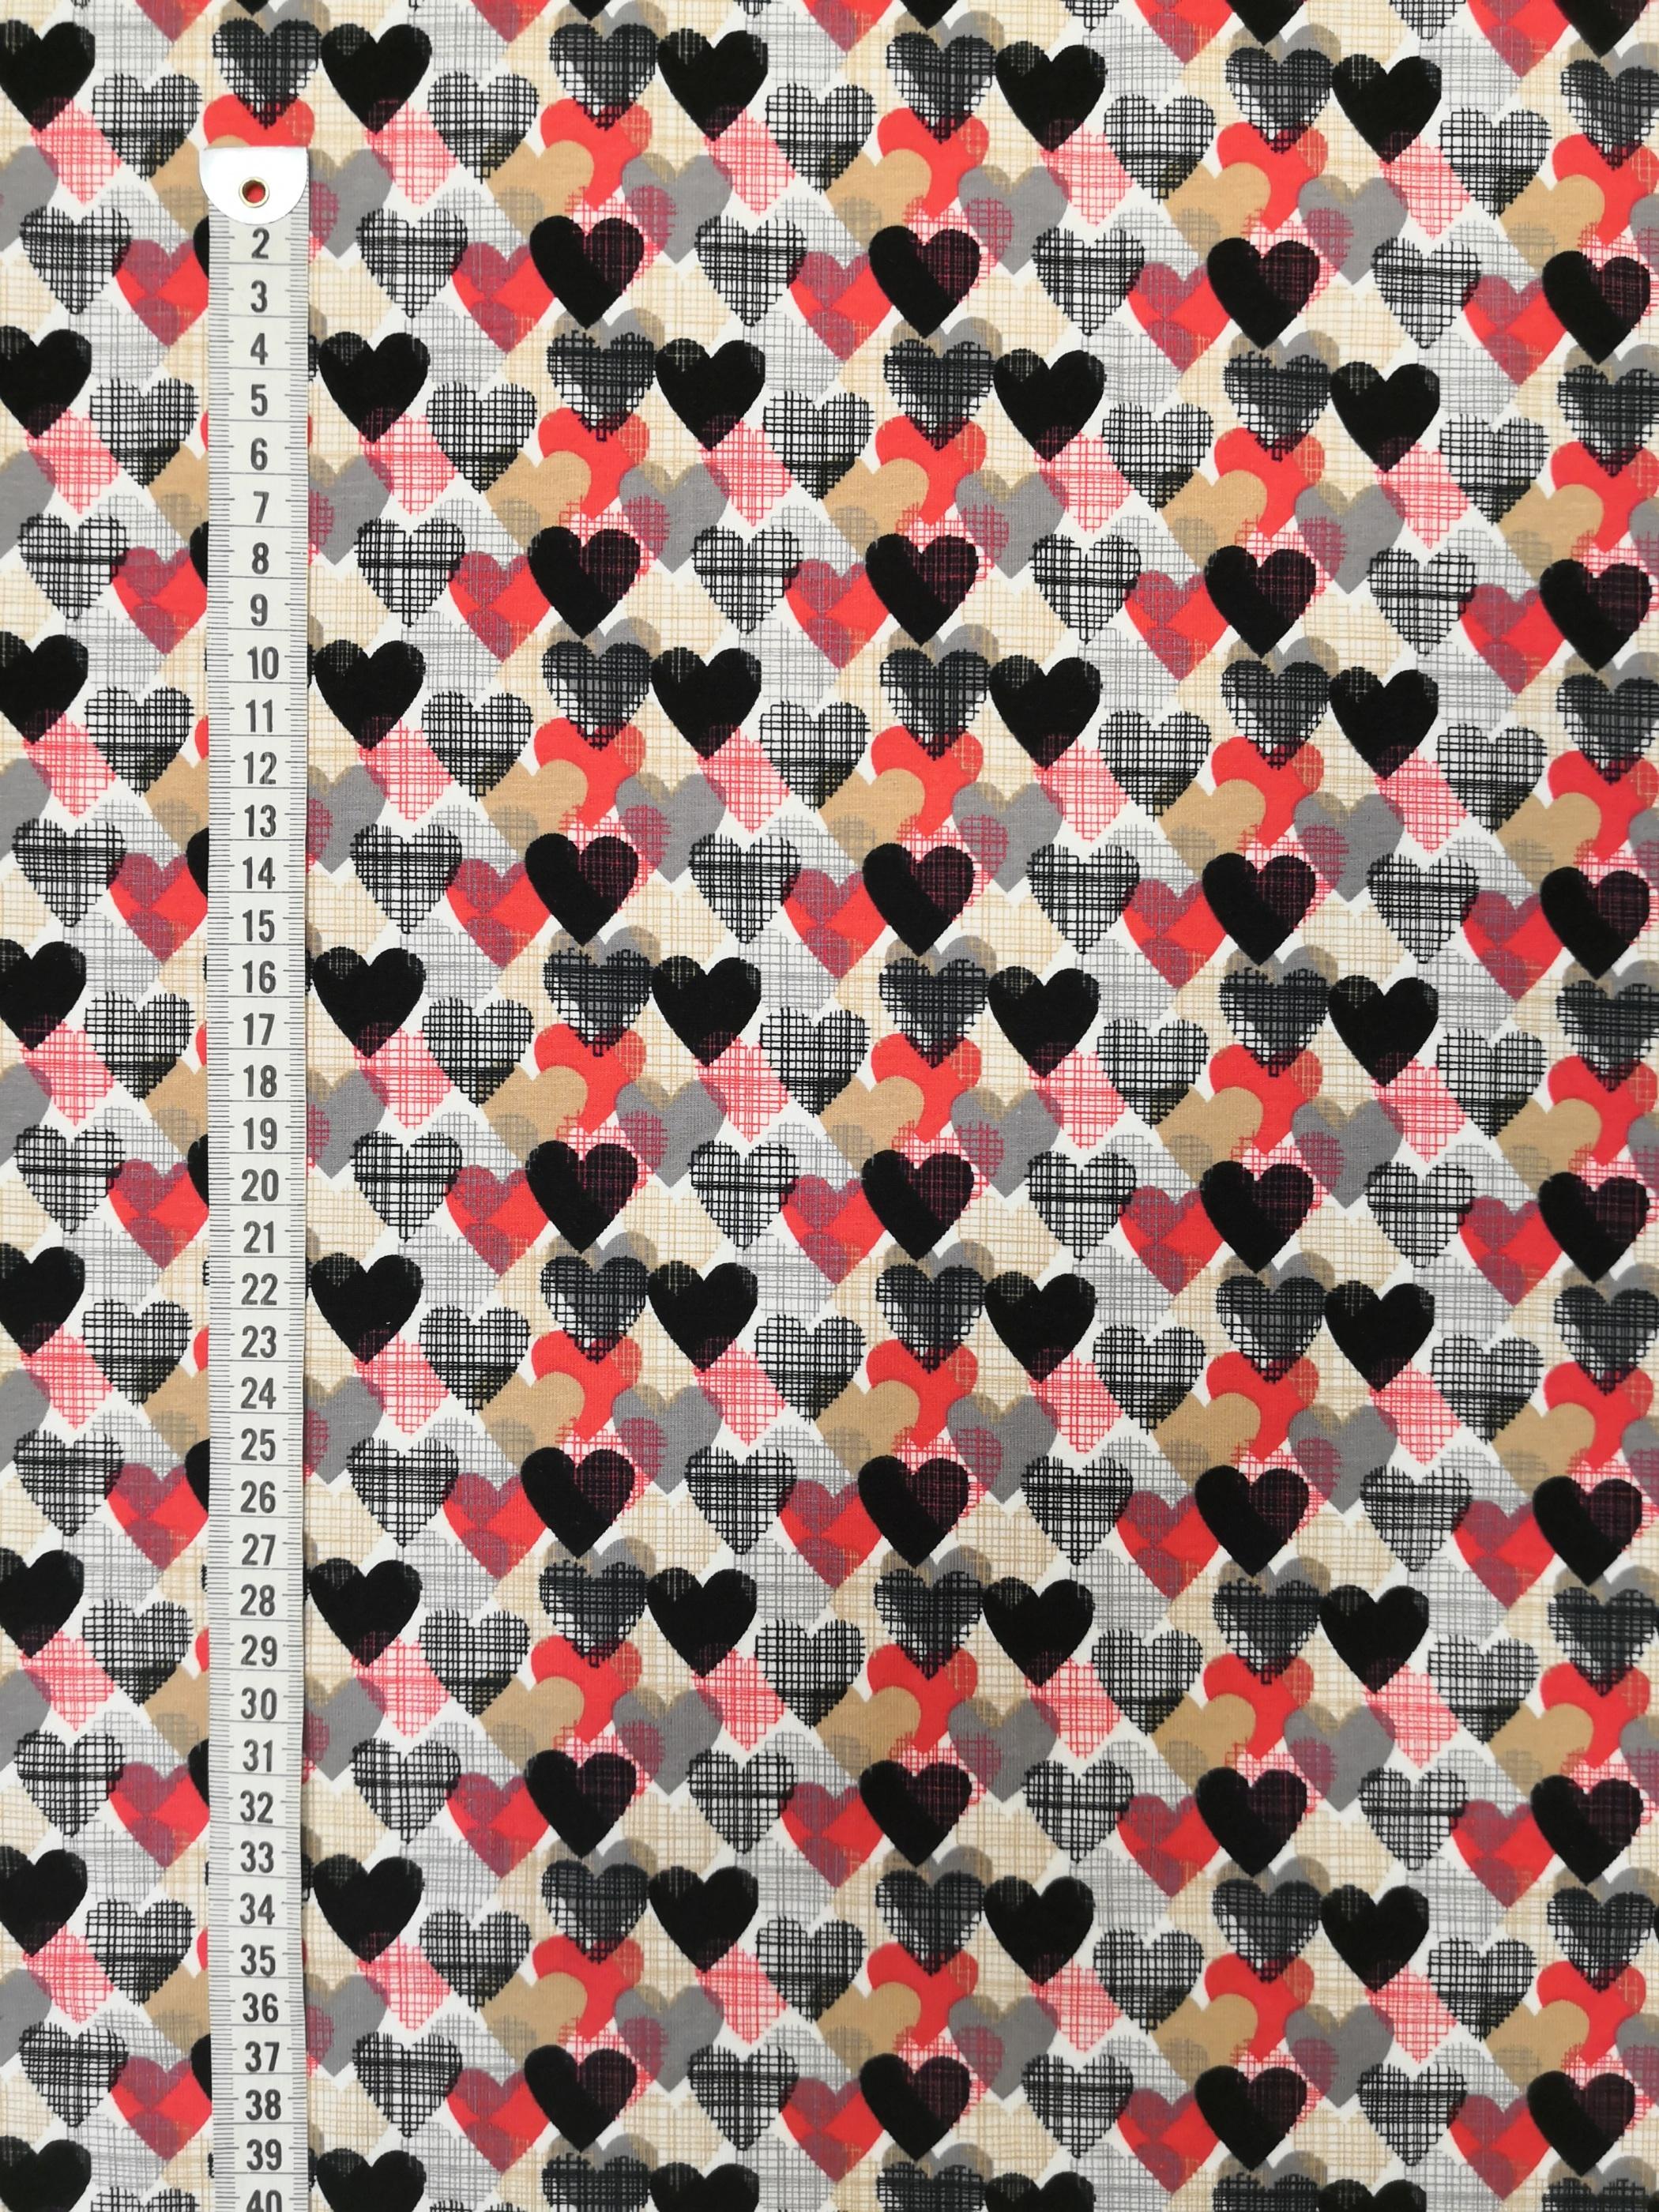 hearts, tyglust, tyg, trikå, mode, sy, sömnad, textil design, metervara, tygaffär